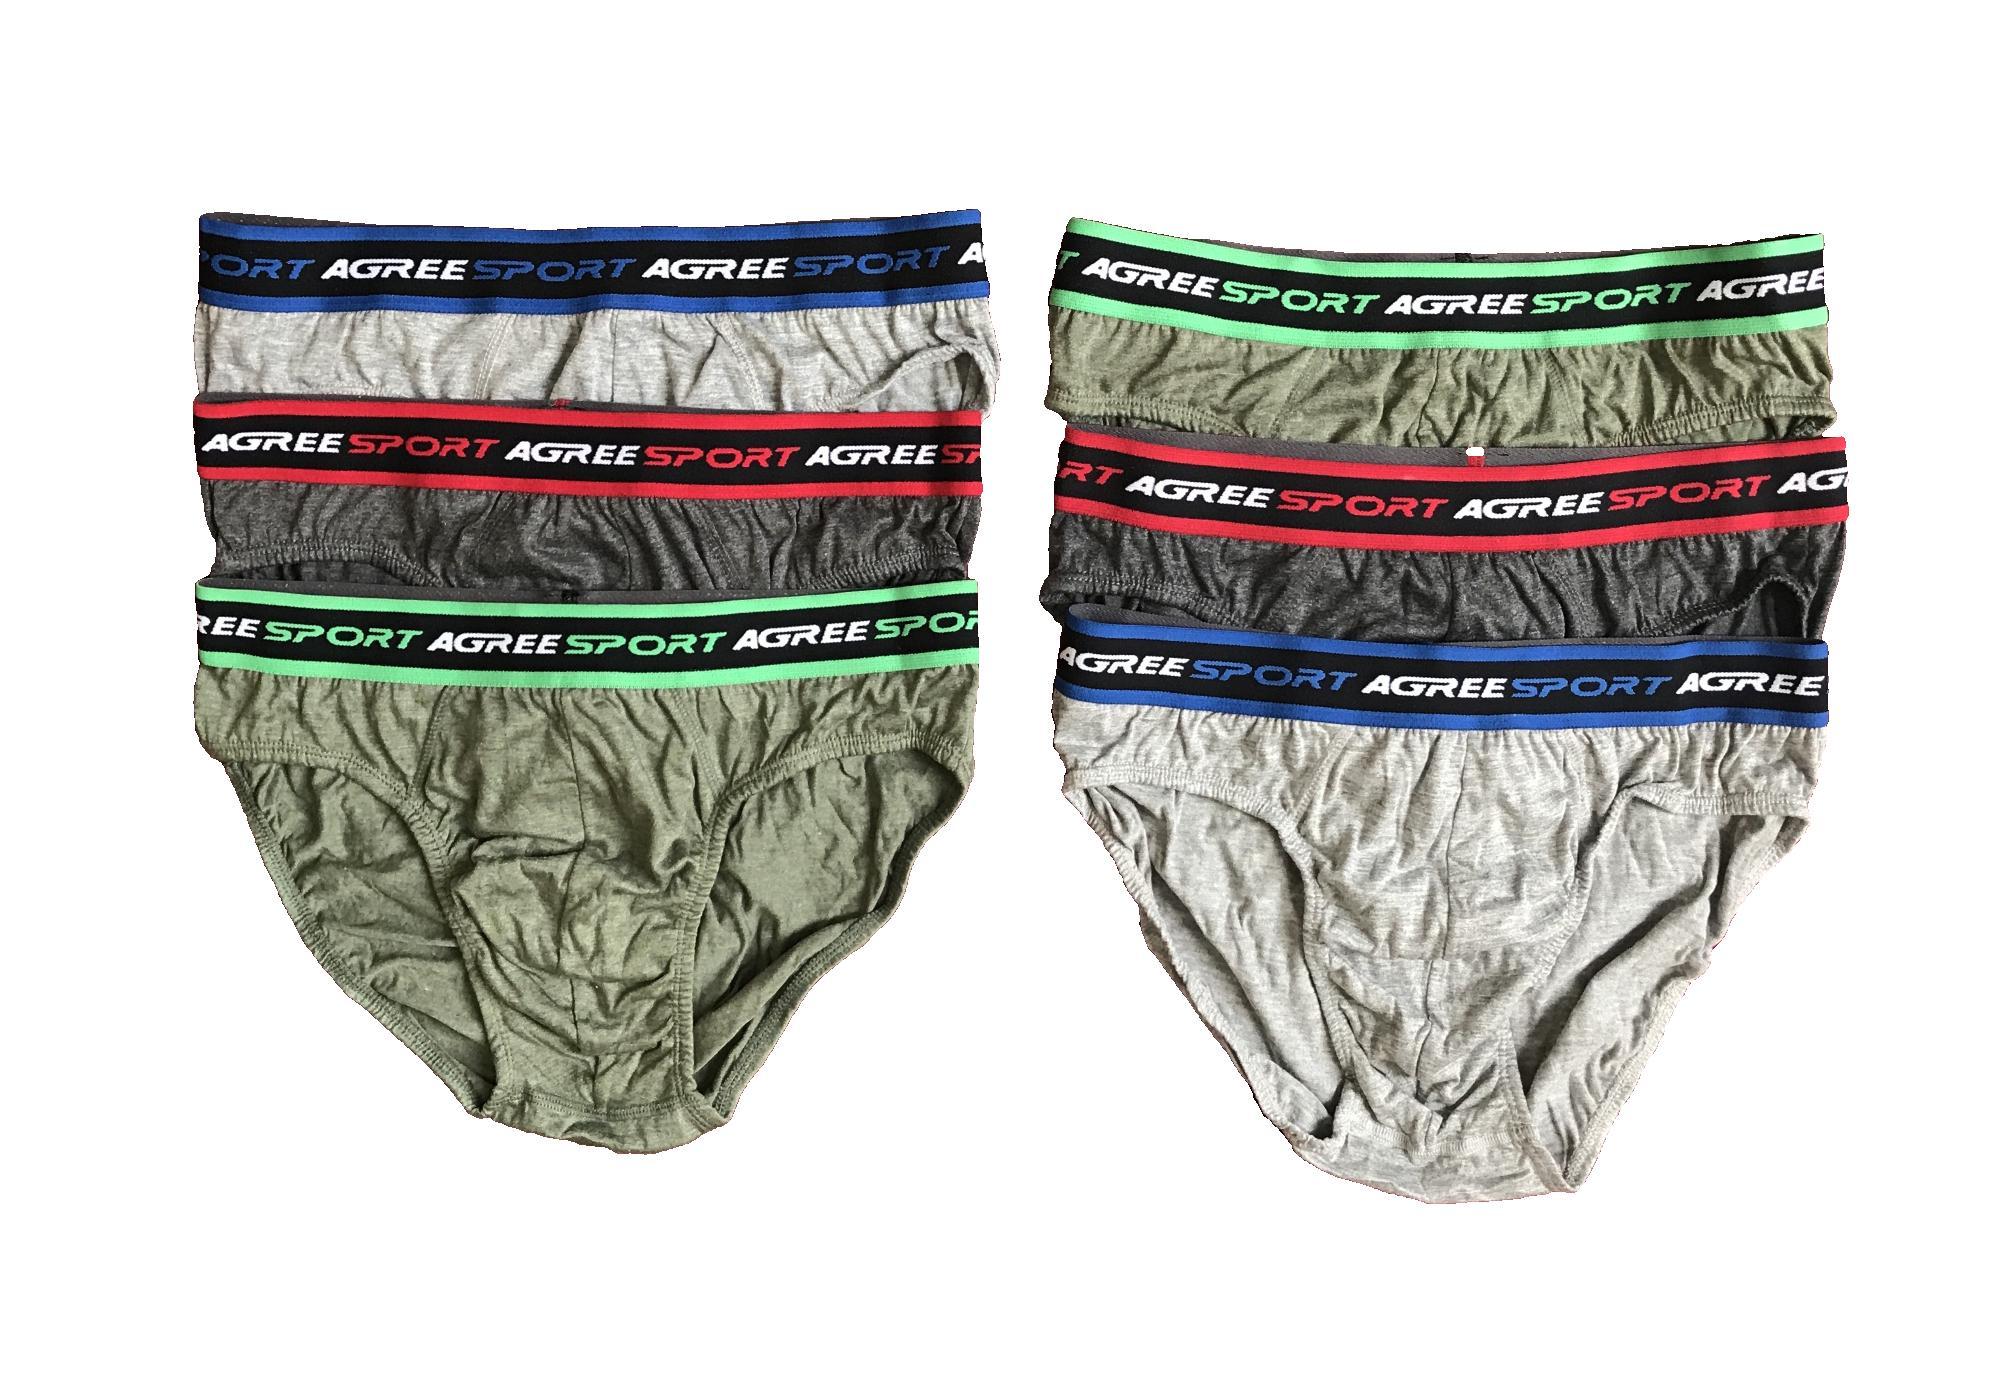 PADIe - 6 PCS Celana Dalam Pria Boxer AGREE SPORT Multi Colour /sempak/underwear Laki-laki